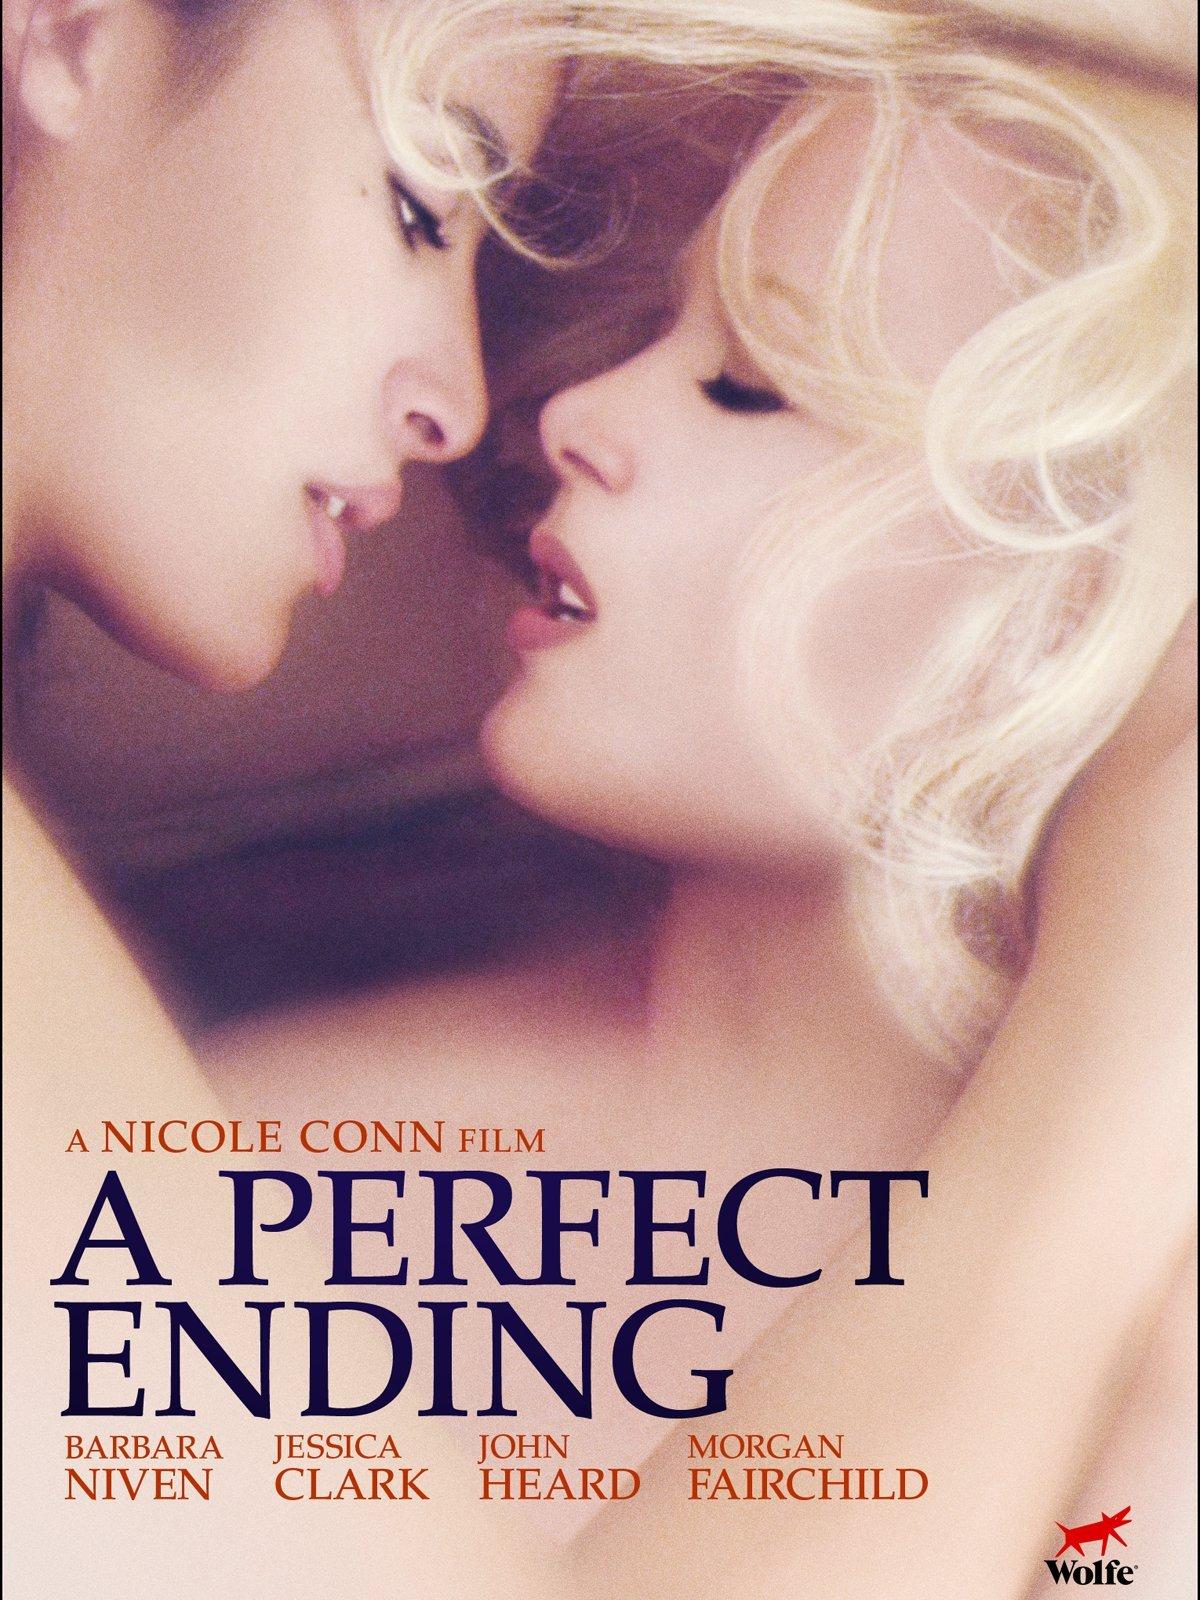 Amazon.com: A Perfect Ending: Barbara Niven, Jessica Clark, John ...